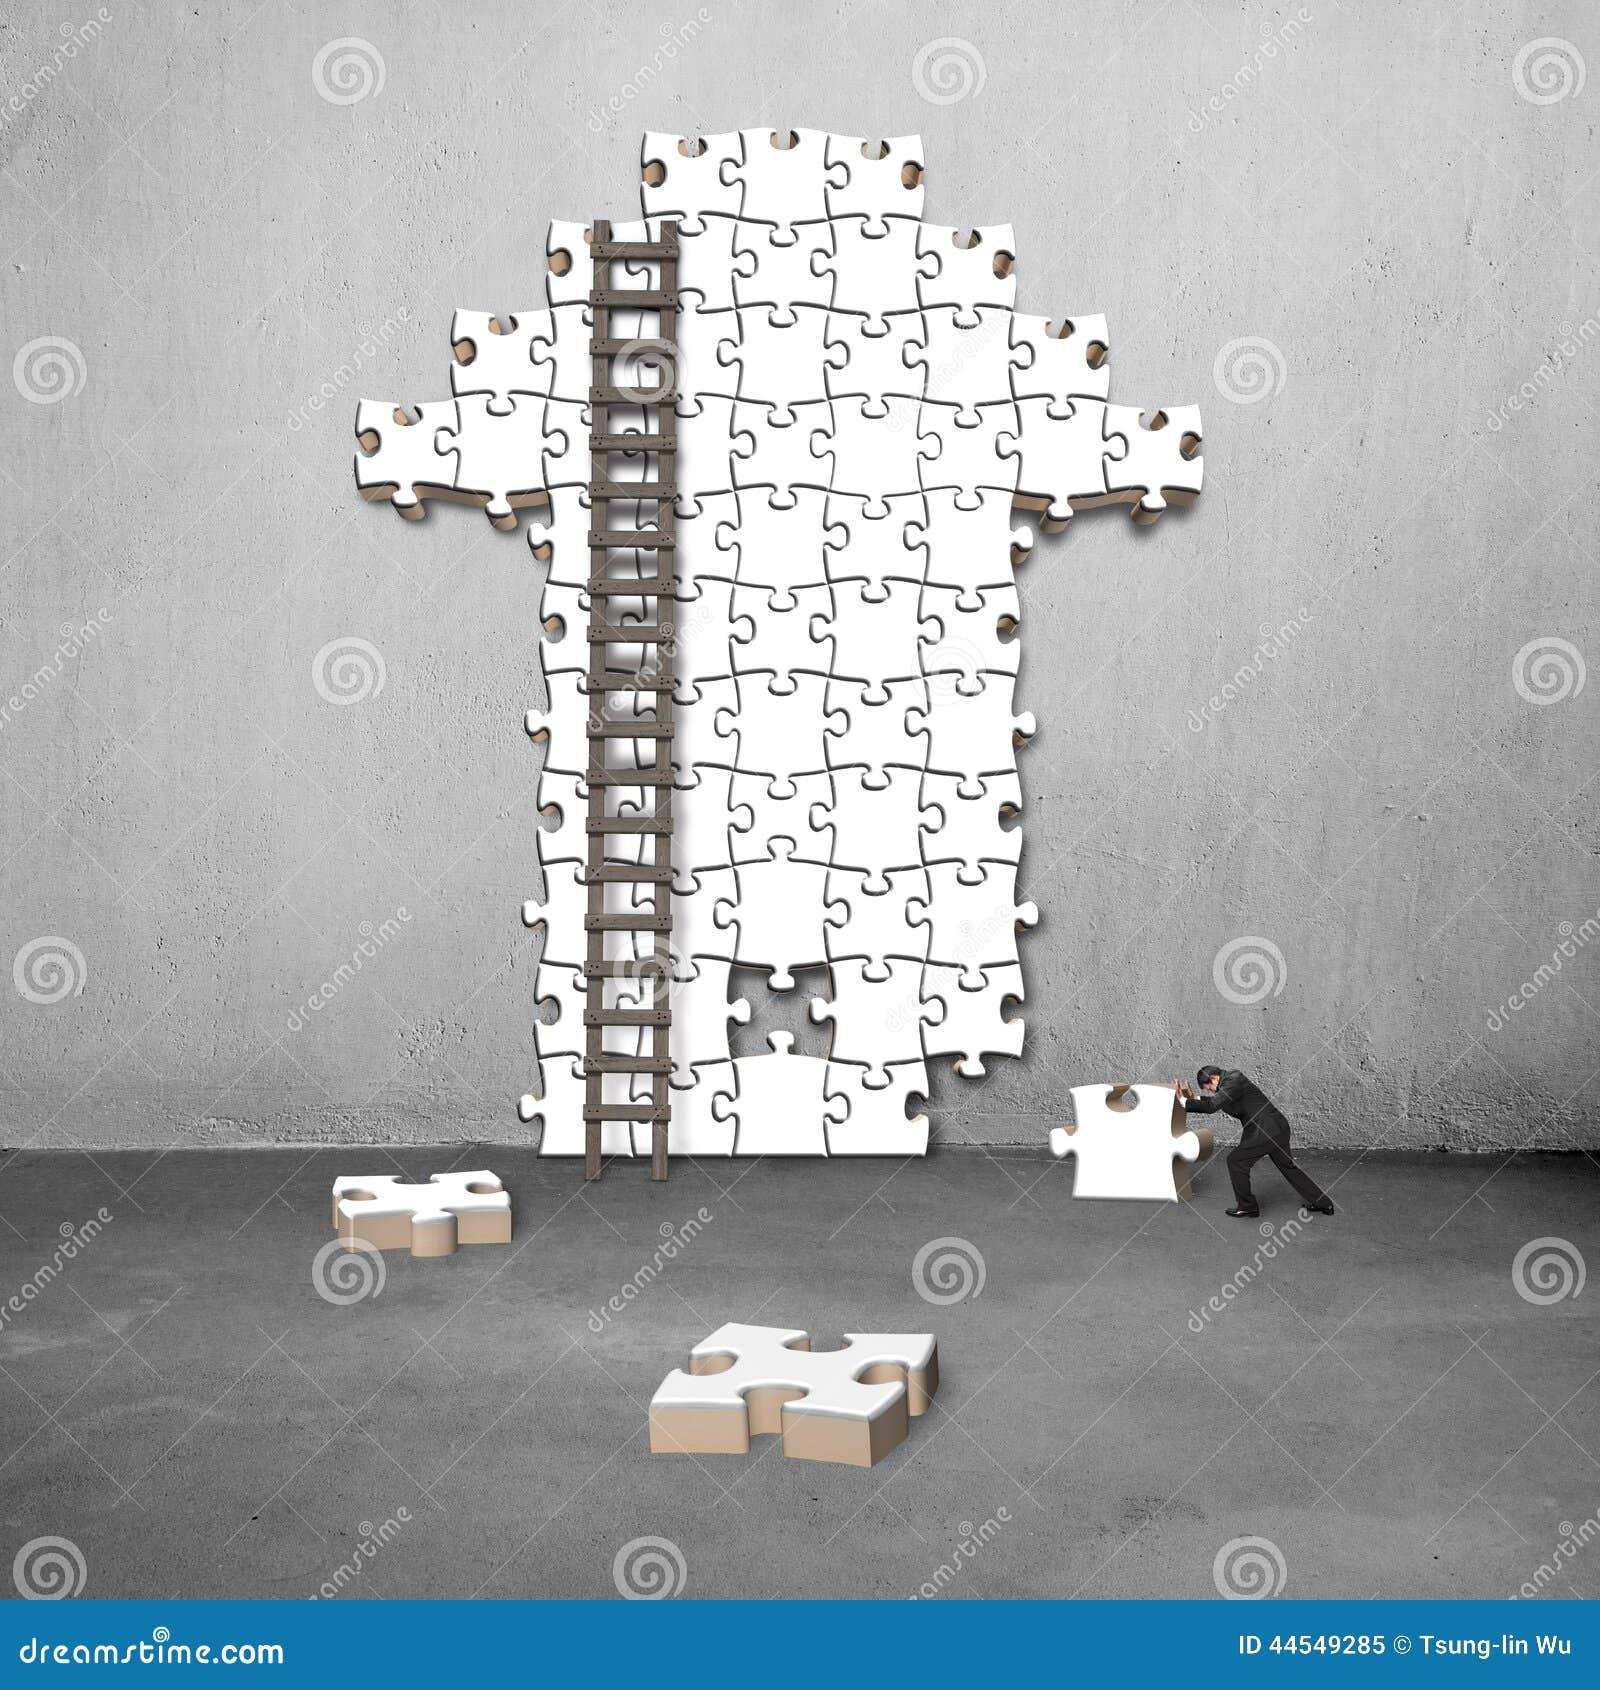 Concrete Push Wall Design : Man push puzzle with arrow shape stock photo image